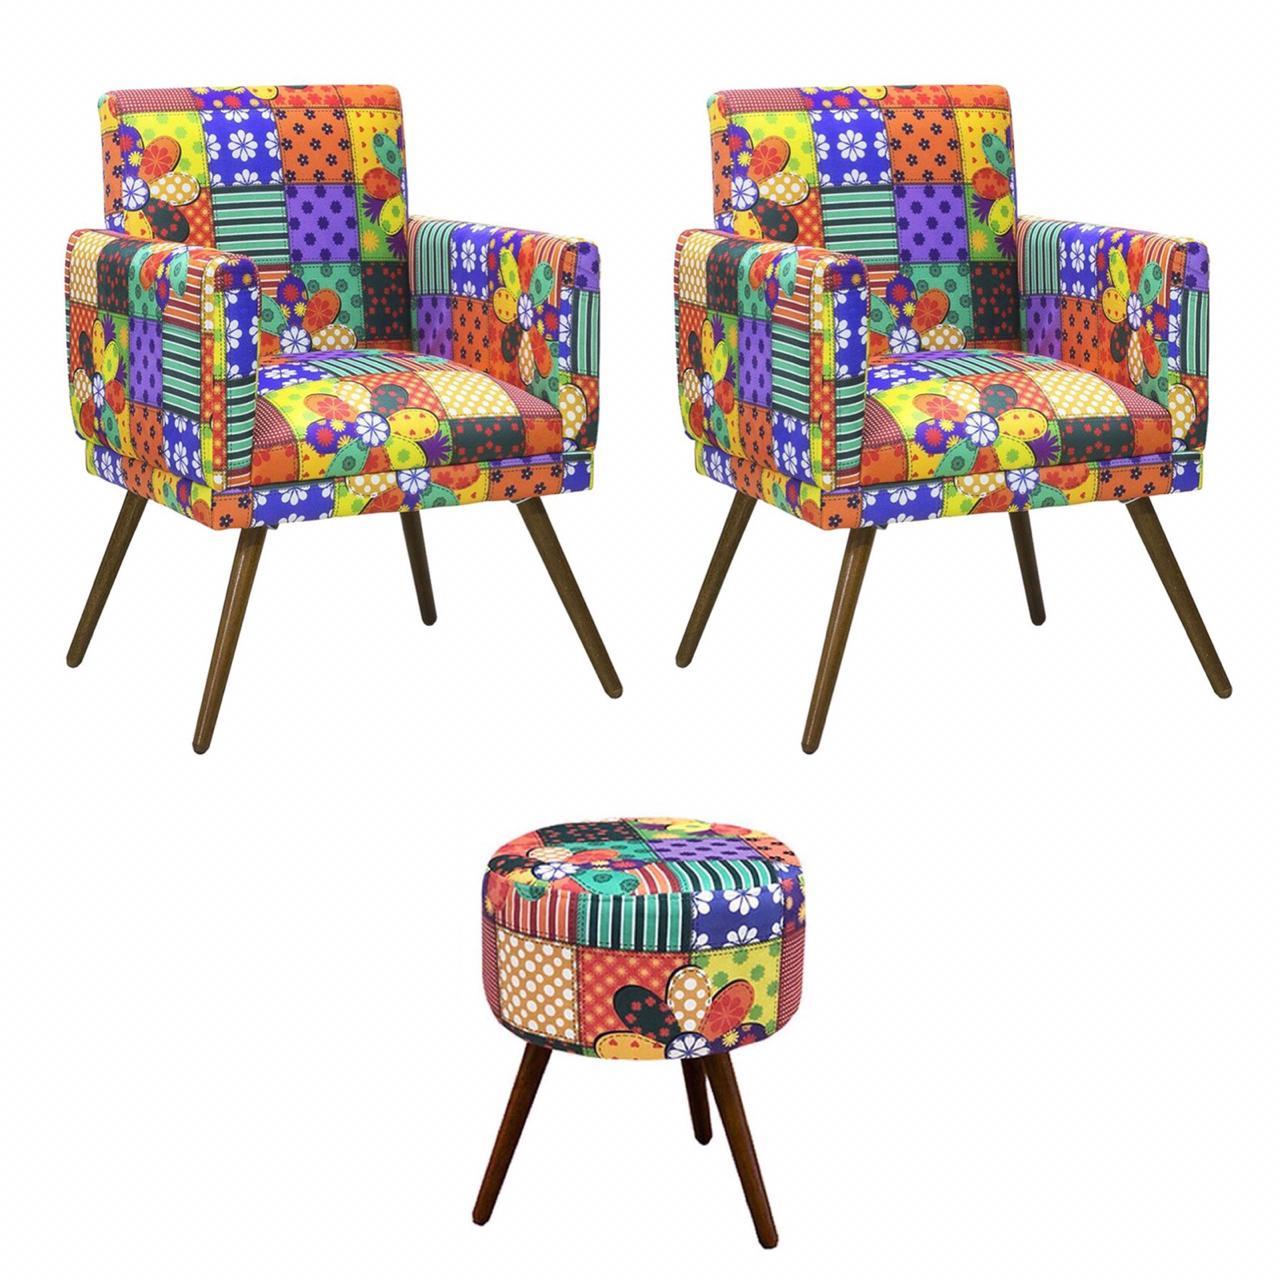 Kit 02 Poltronas Decorativa Nina com rodapé e Puff redondo Patchwork - Bela Casa Shop